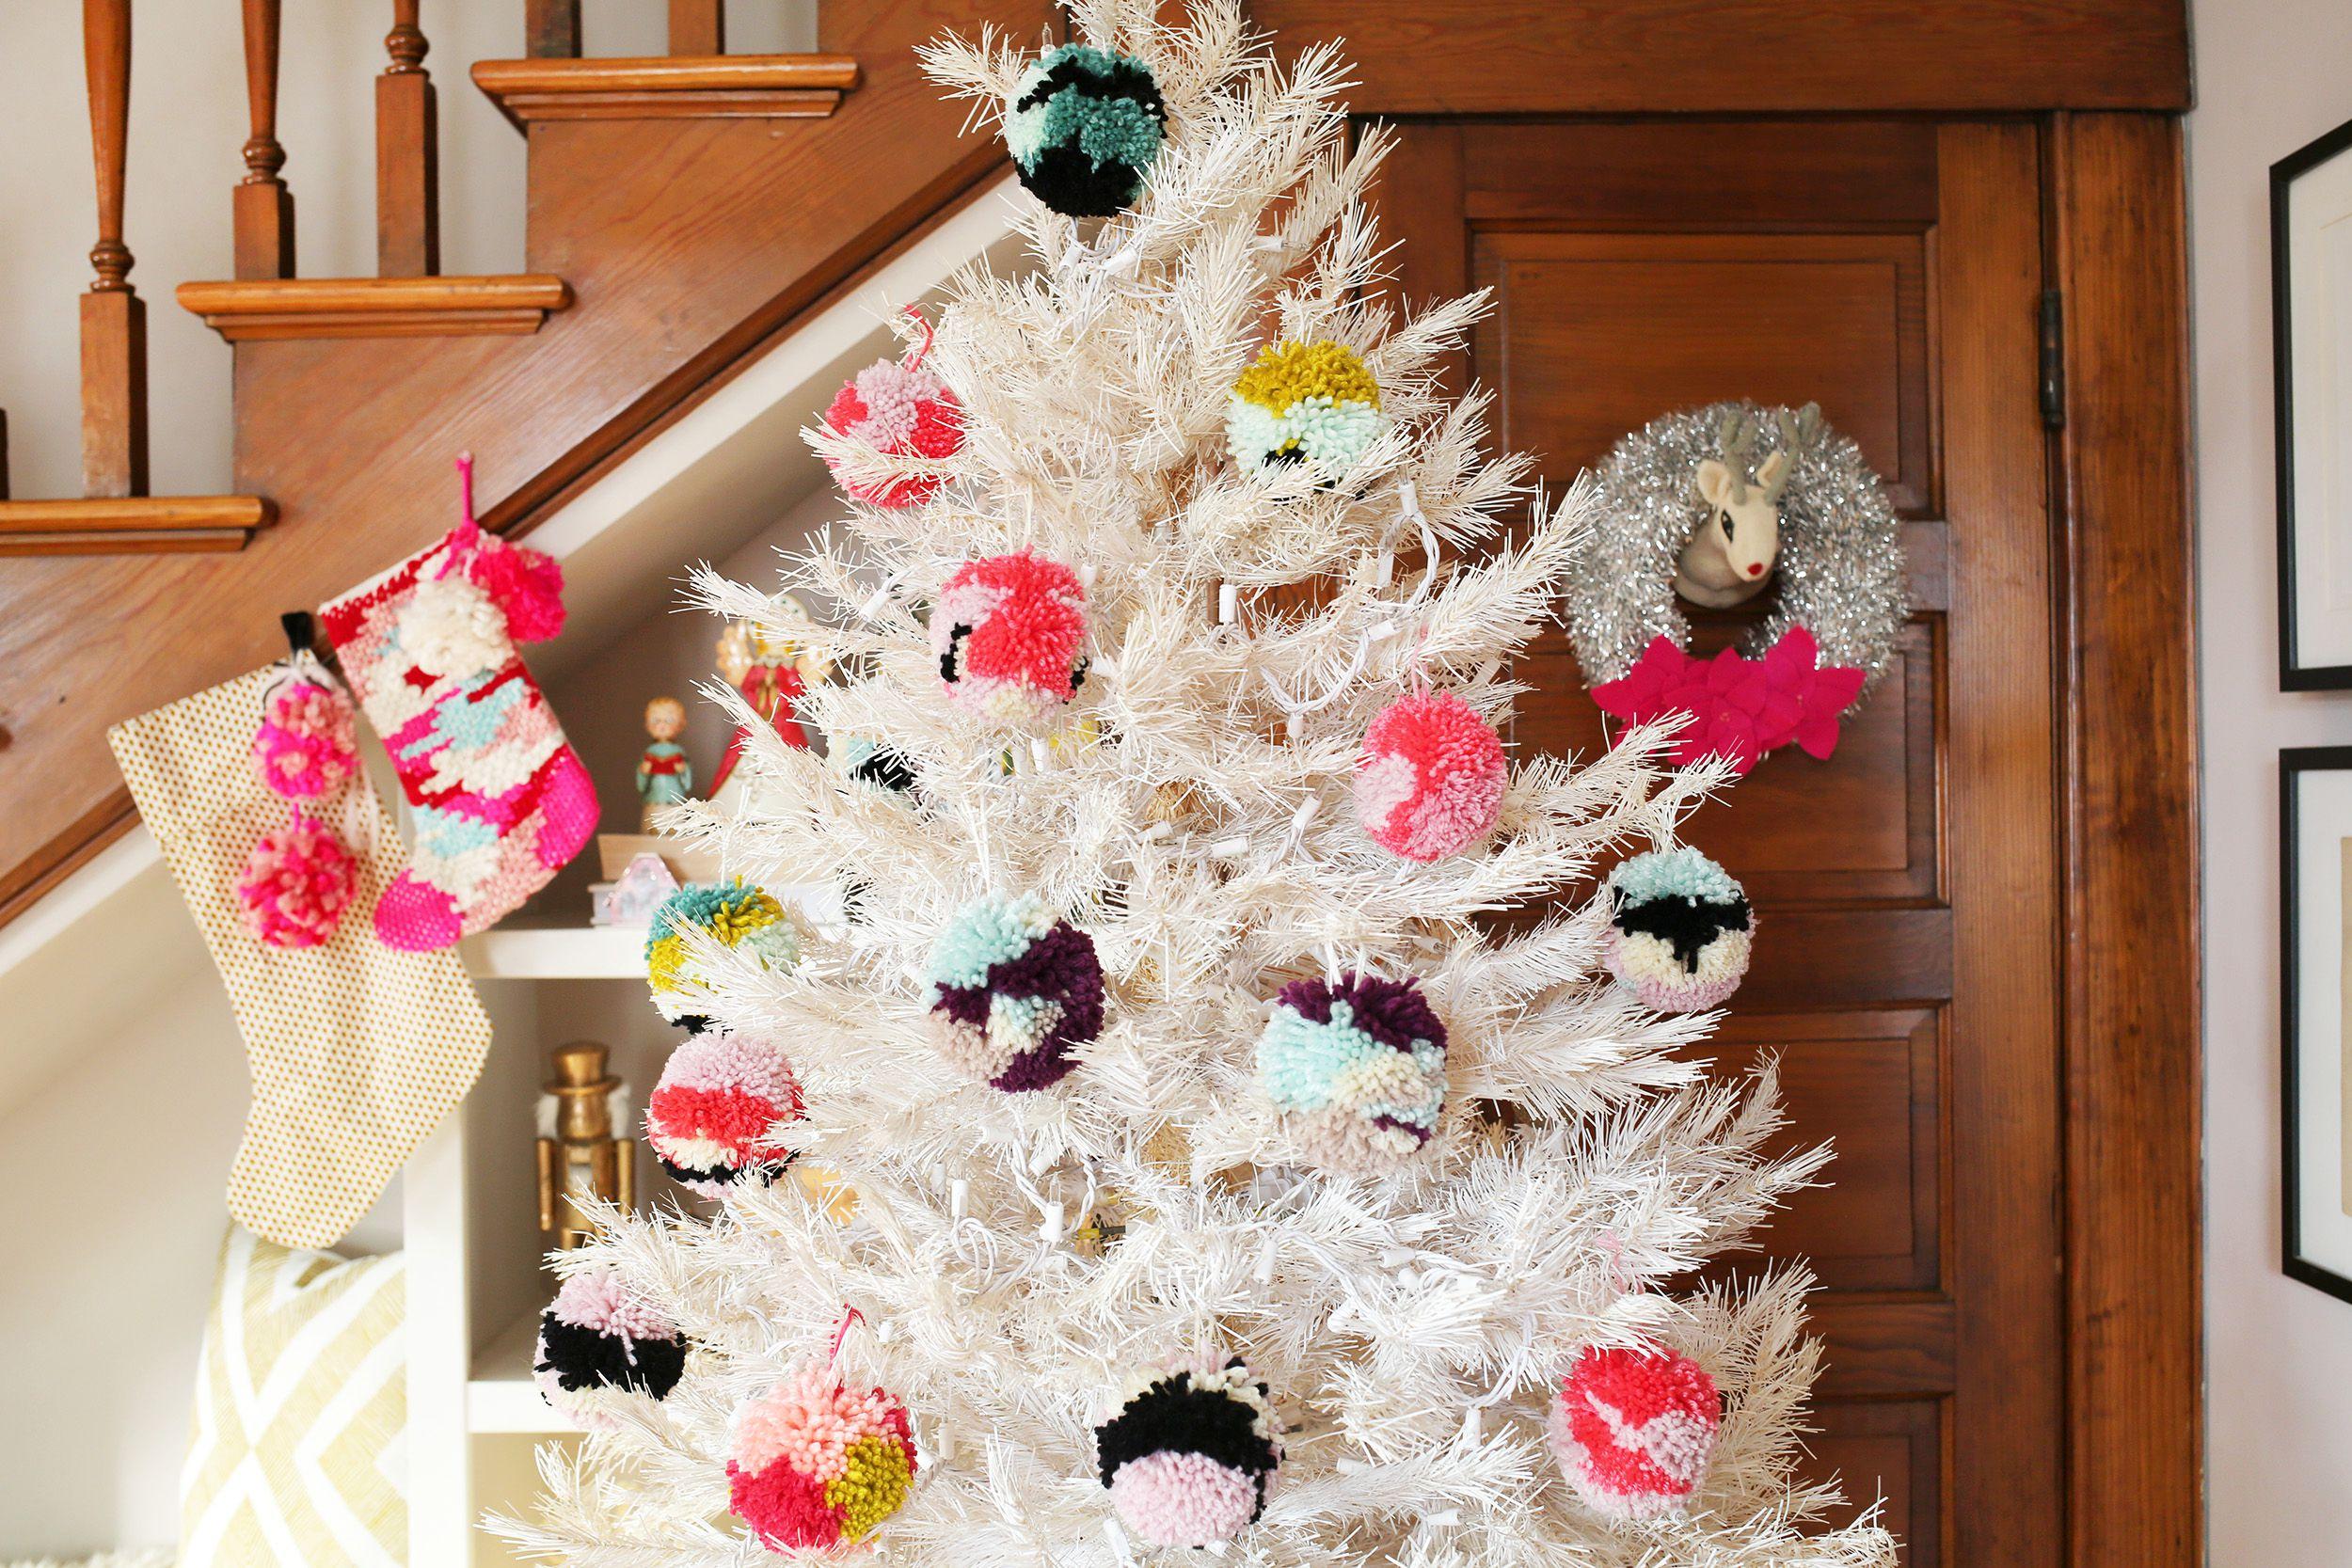 neutrals 5 tissue paper pom poms wedding decoration.htm 33 festive ways to decorate your christmas tree  decorate your christmas tree